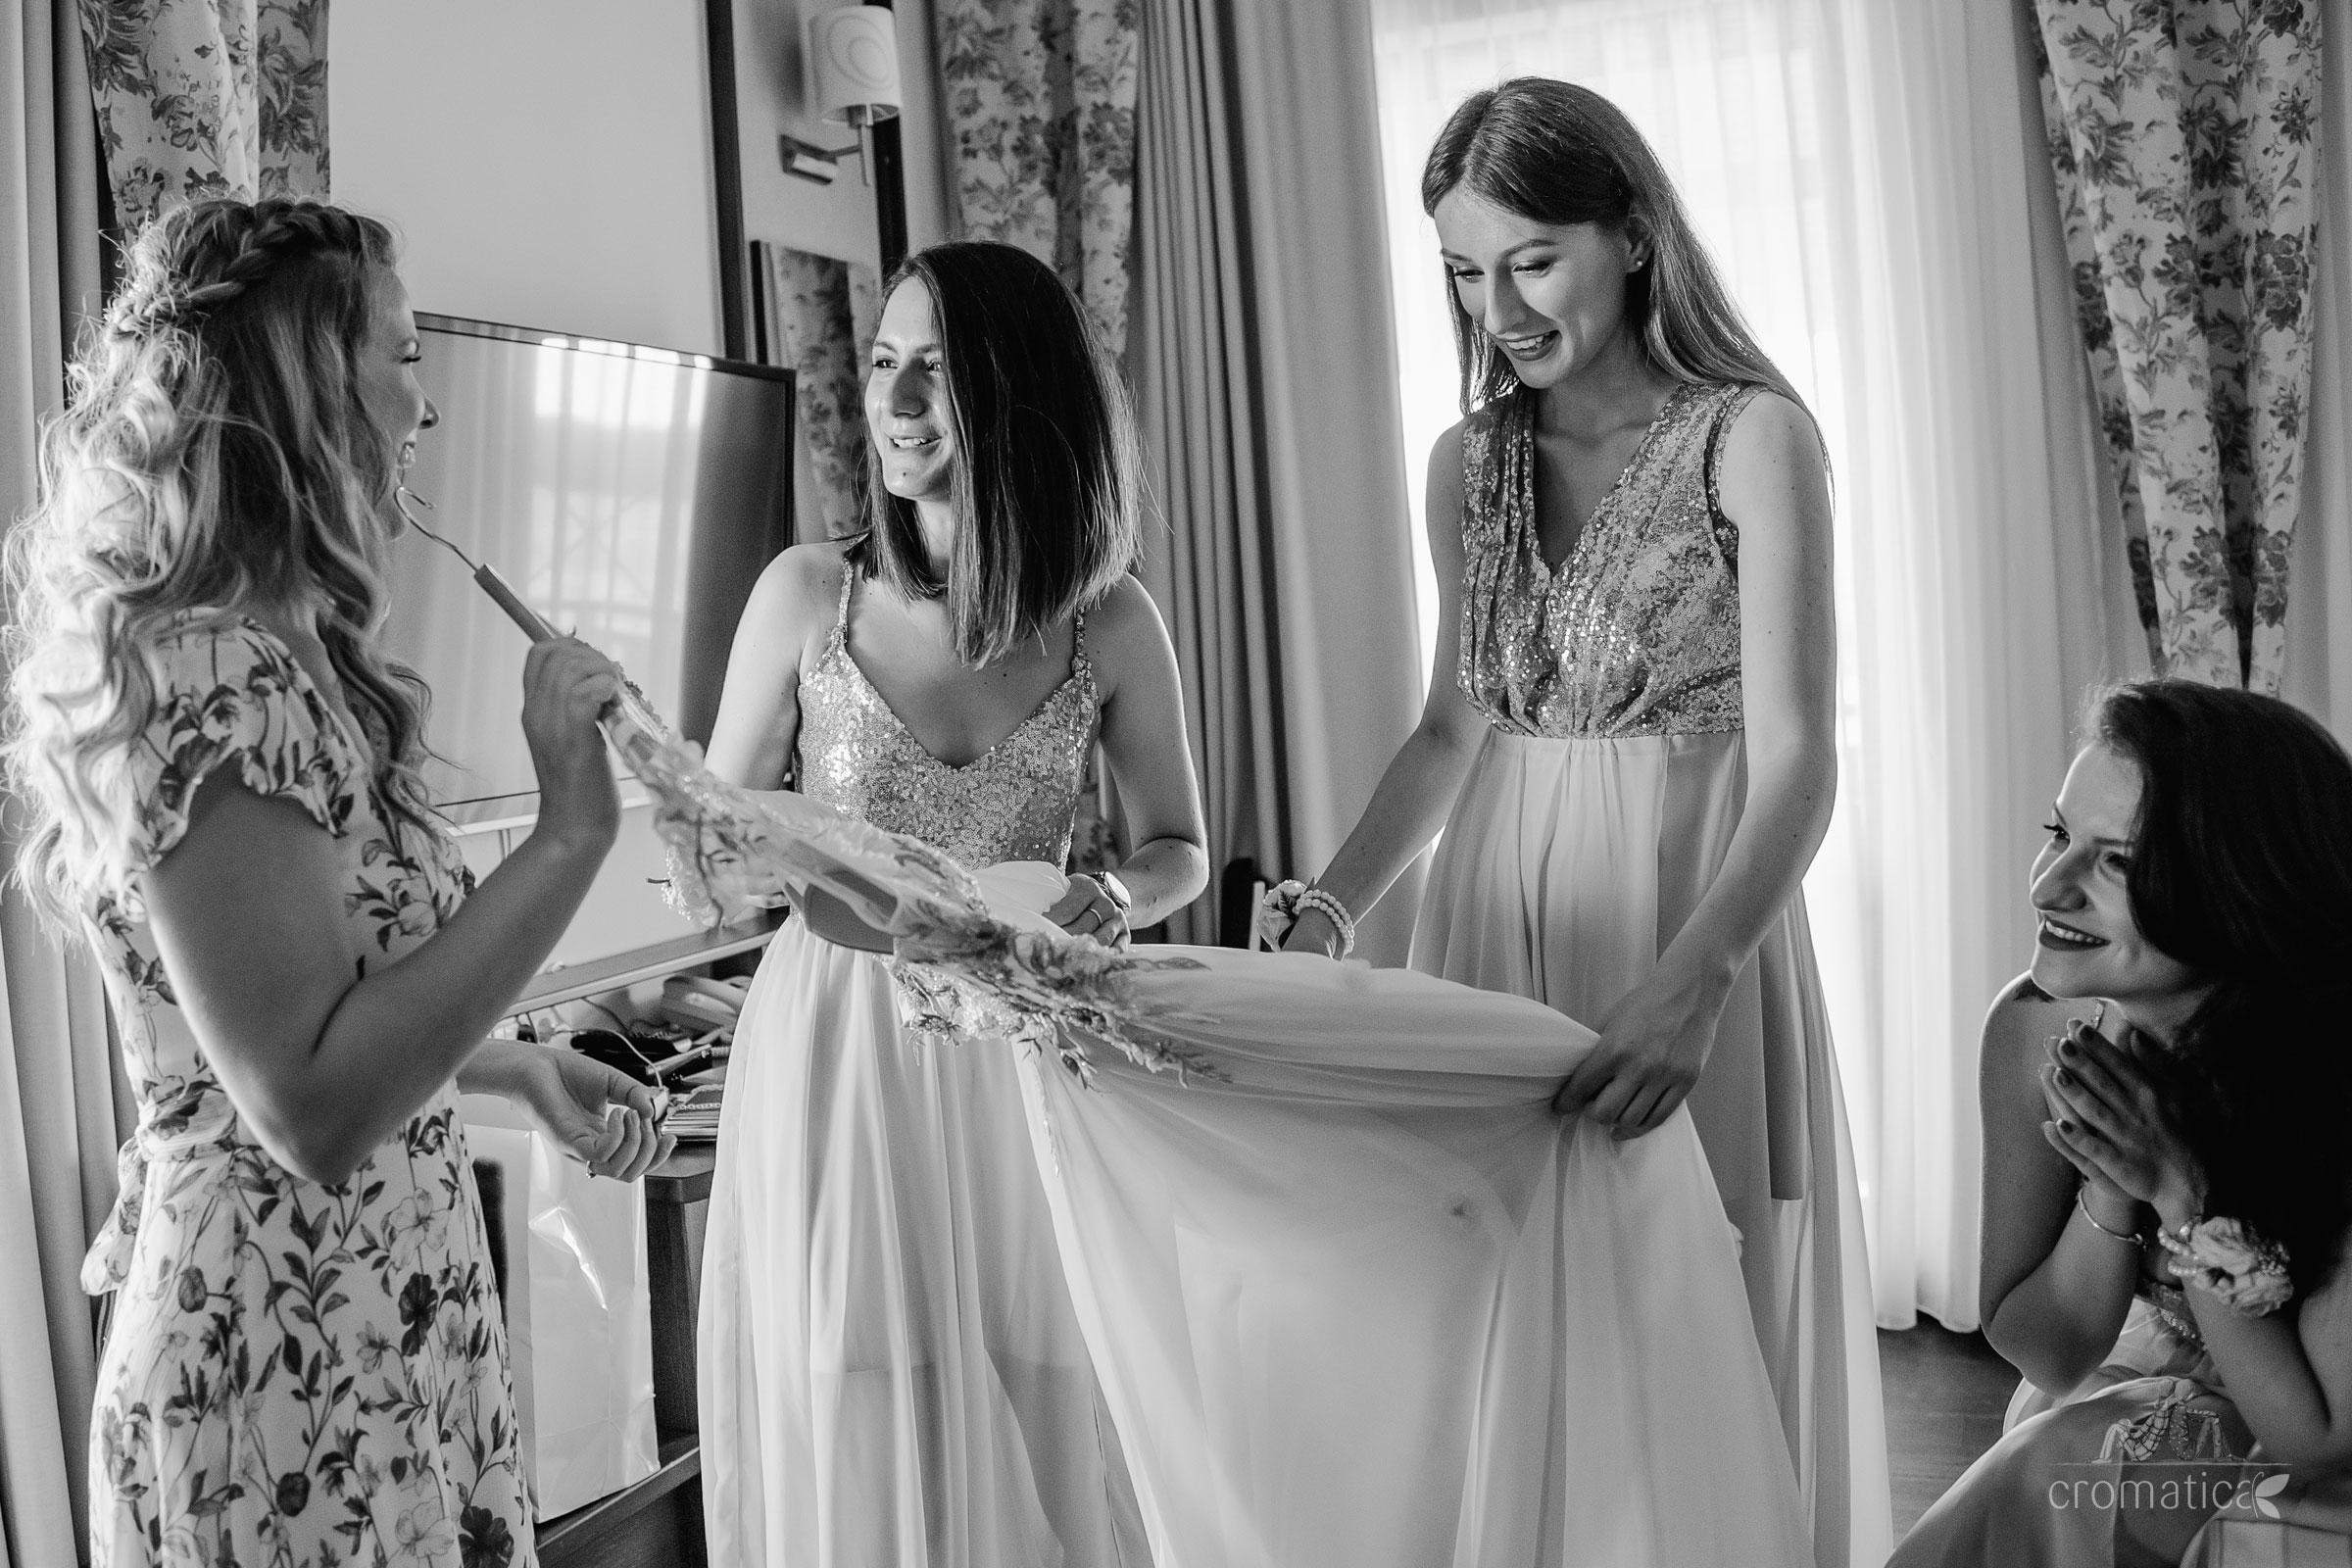 alexandra george fotografii nunta casa vlasia 006